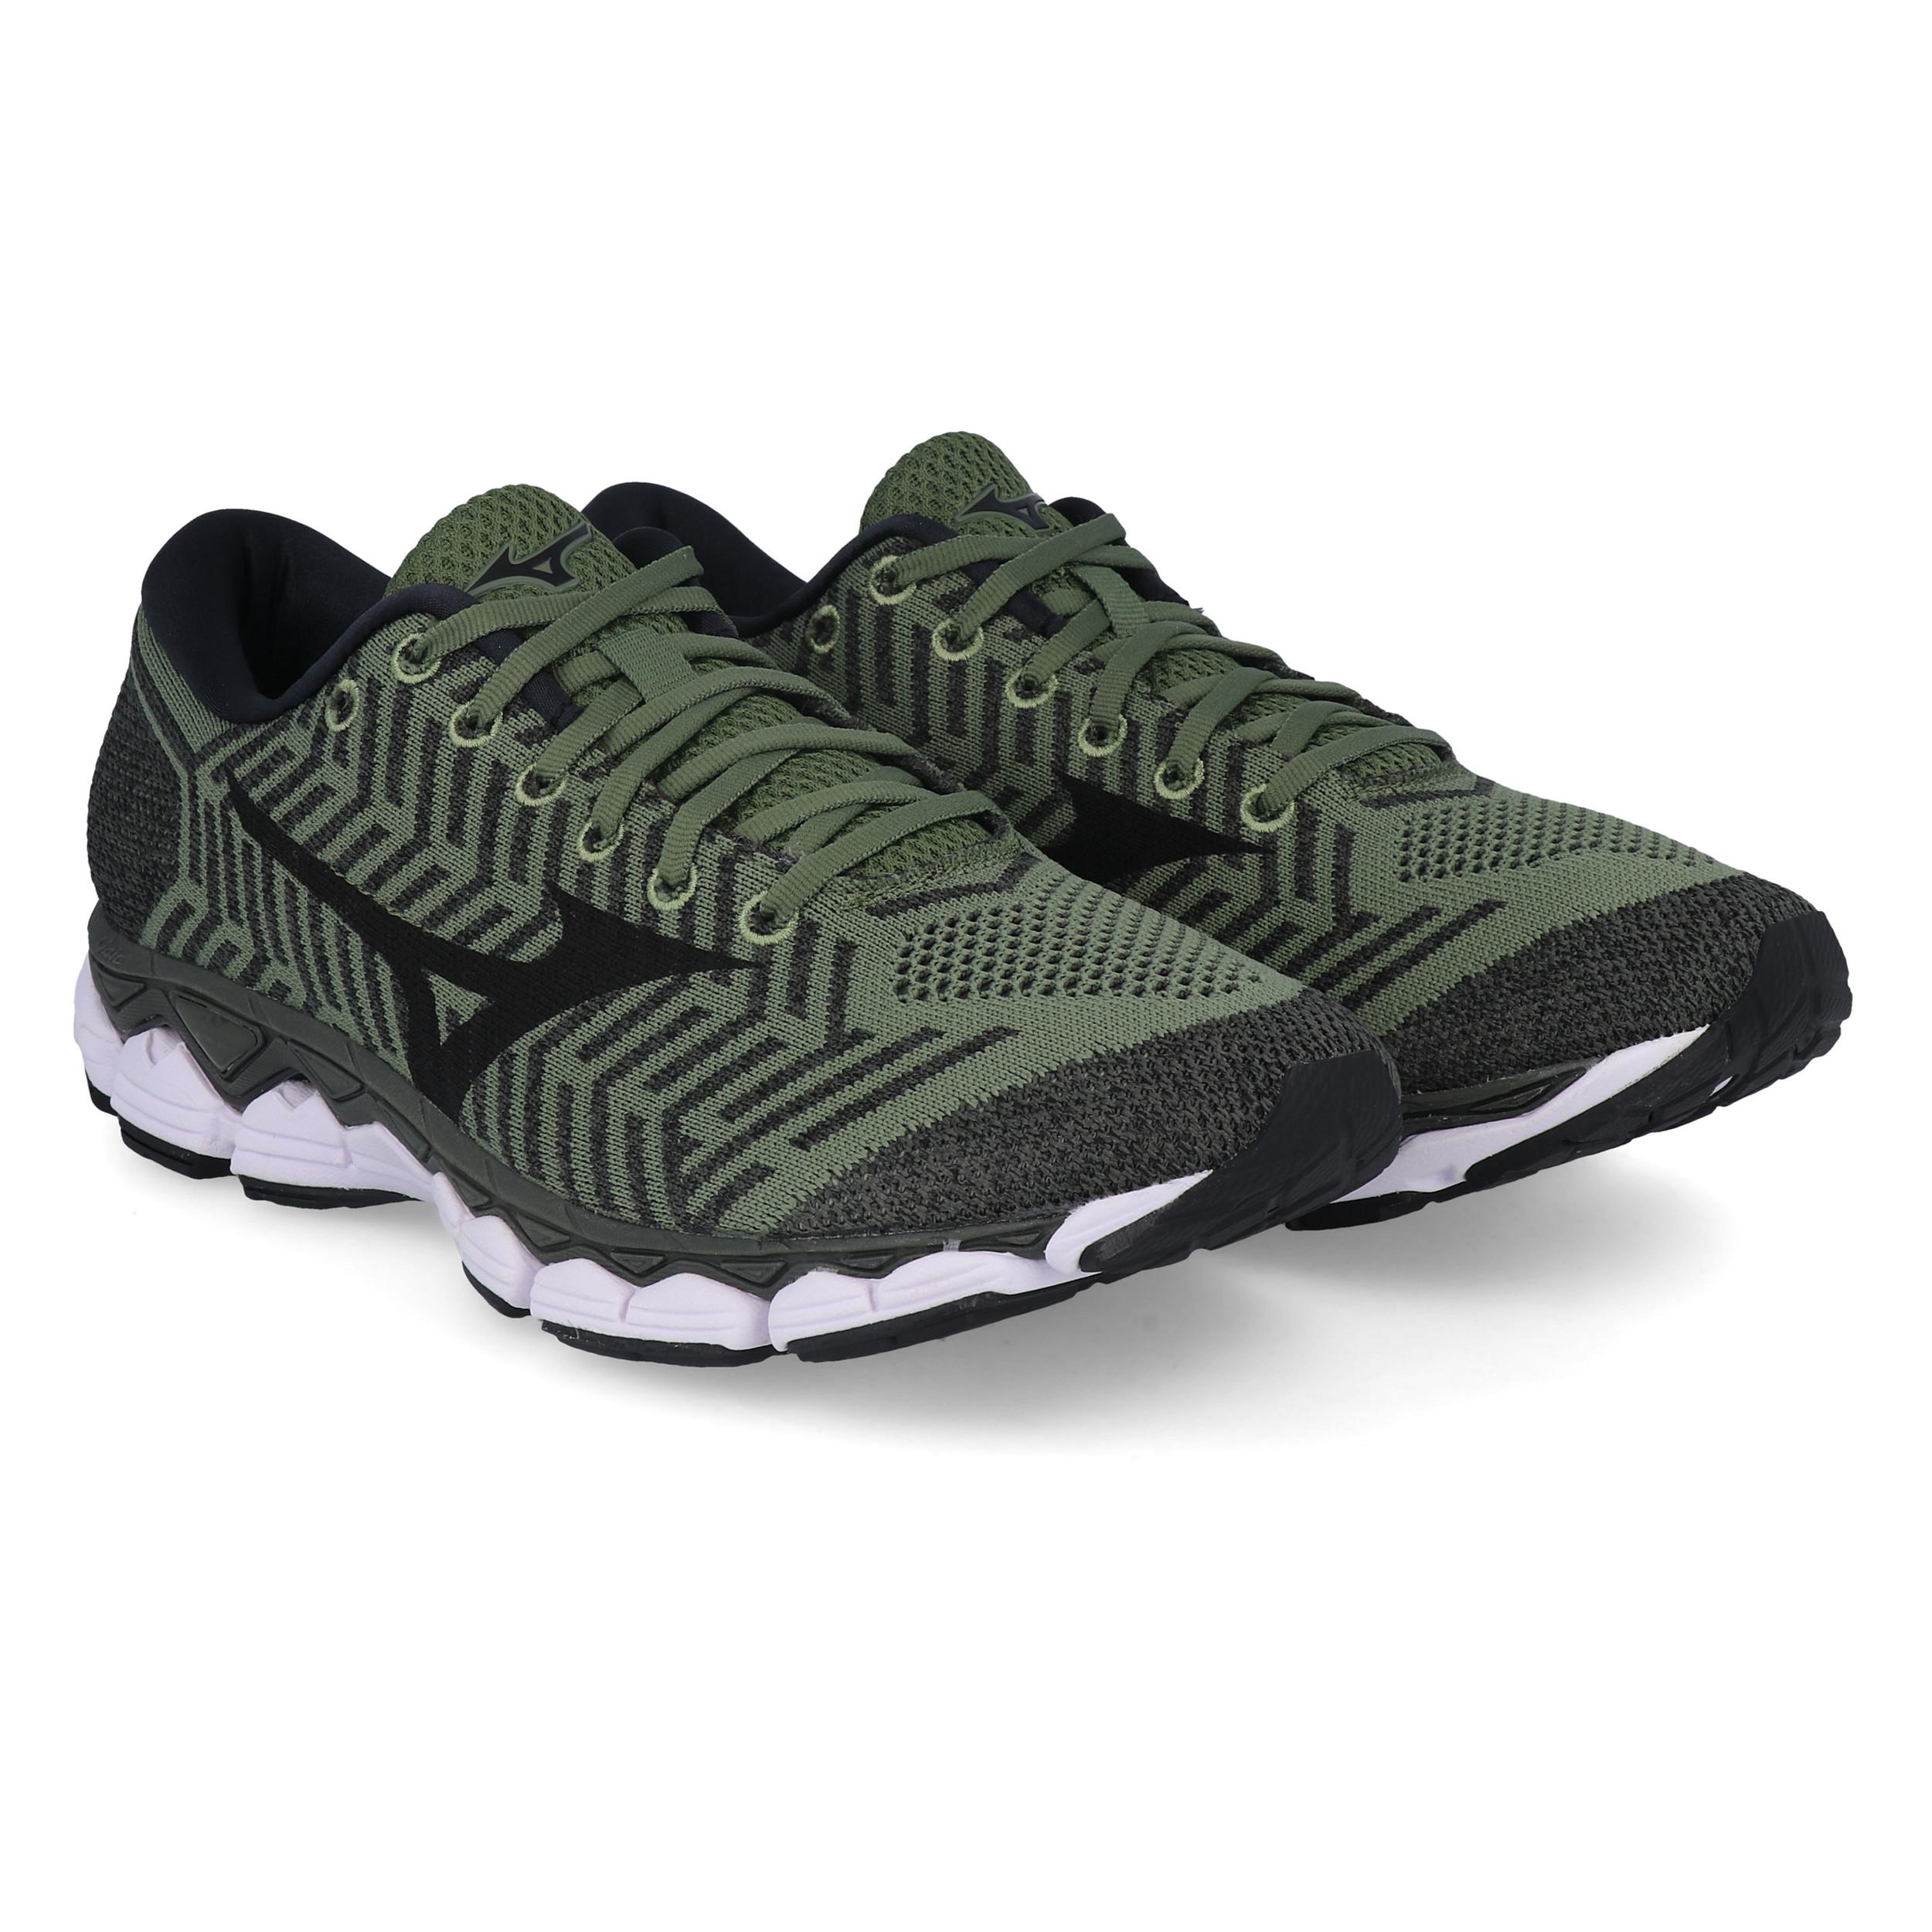 Mizuno Waveknit S1 Running Shoes